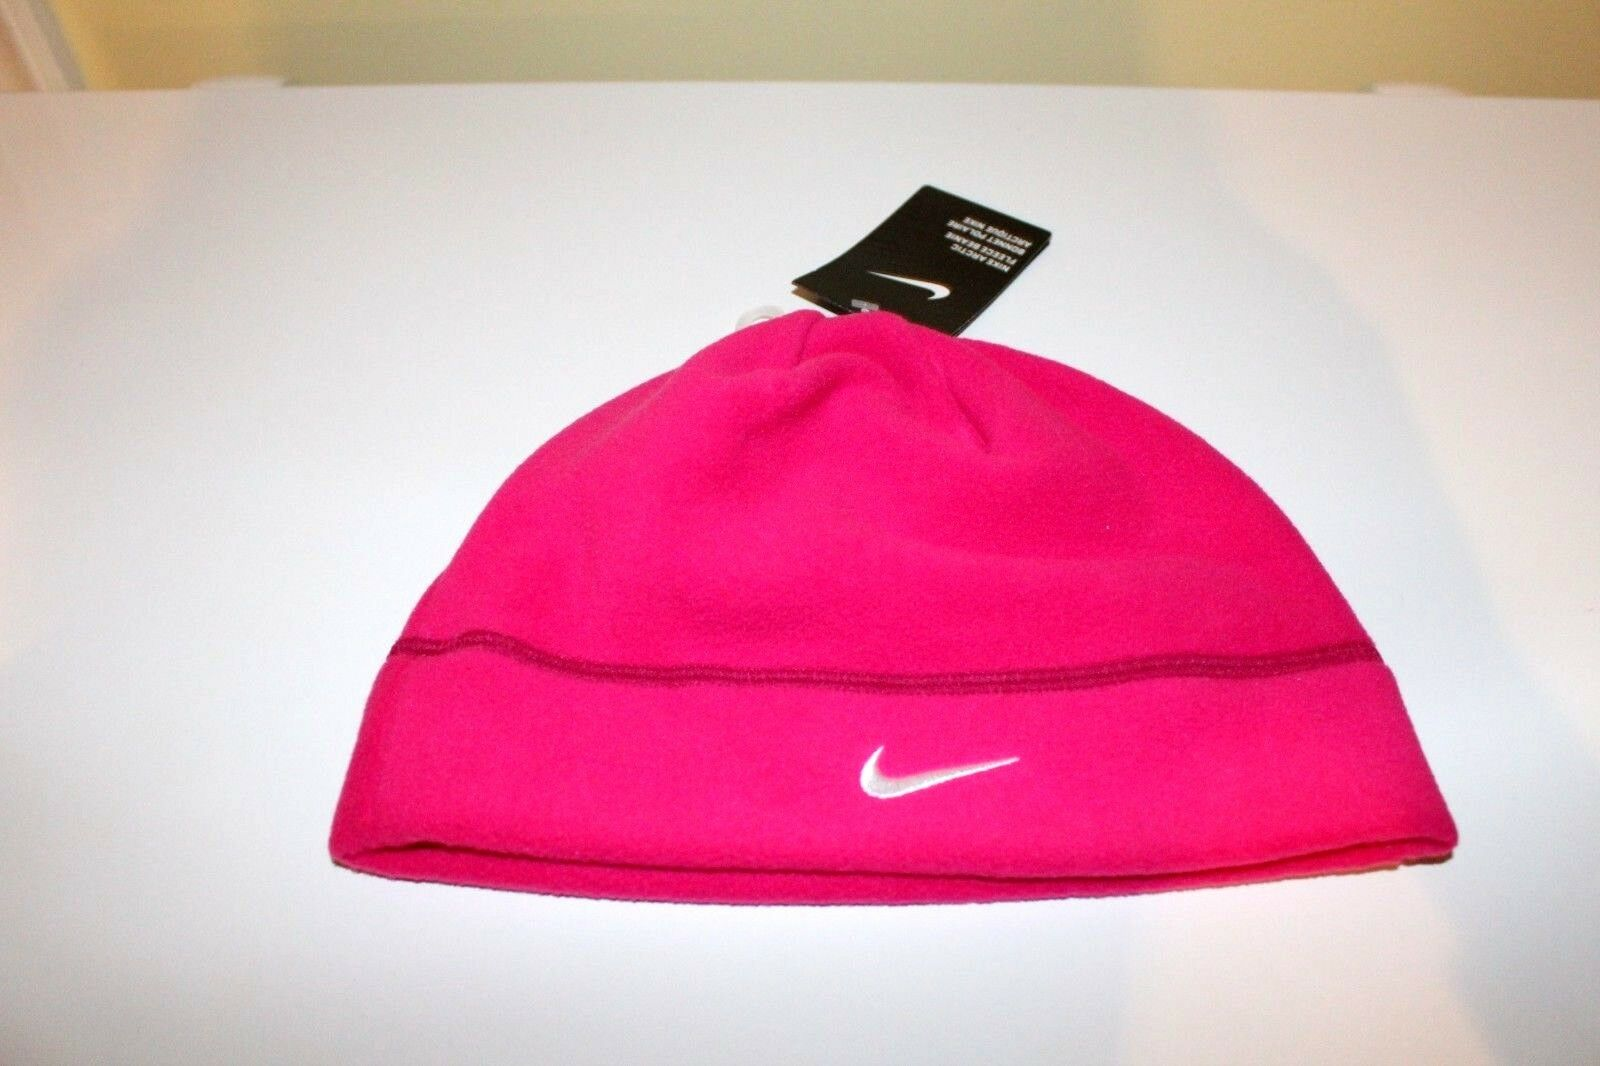 c4076a03835 Nike Pink Arctic Fleece Beanie Cap Hat Adult Unisex Skate snowboard ...